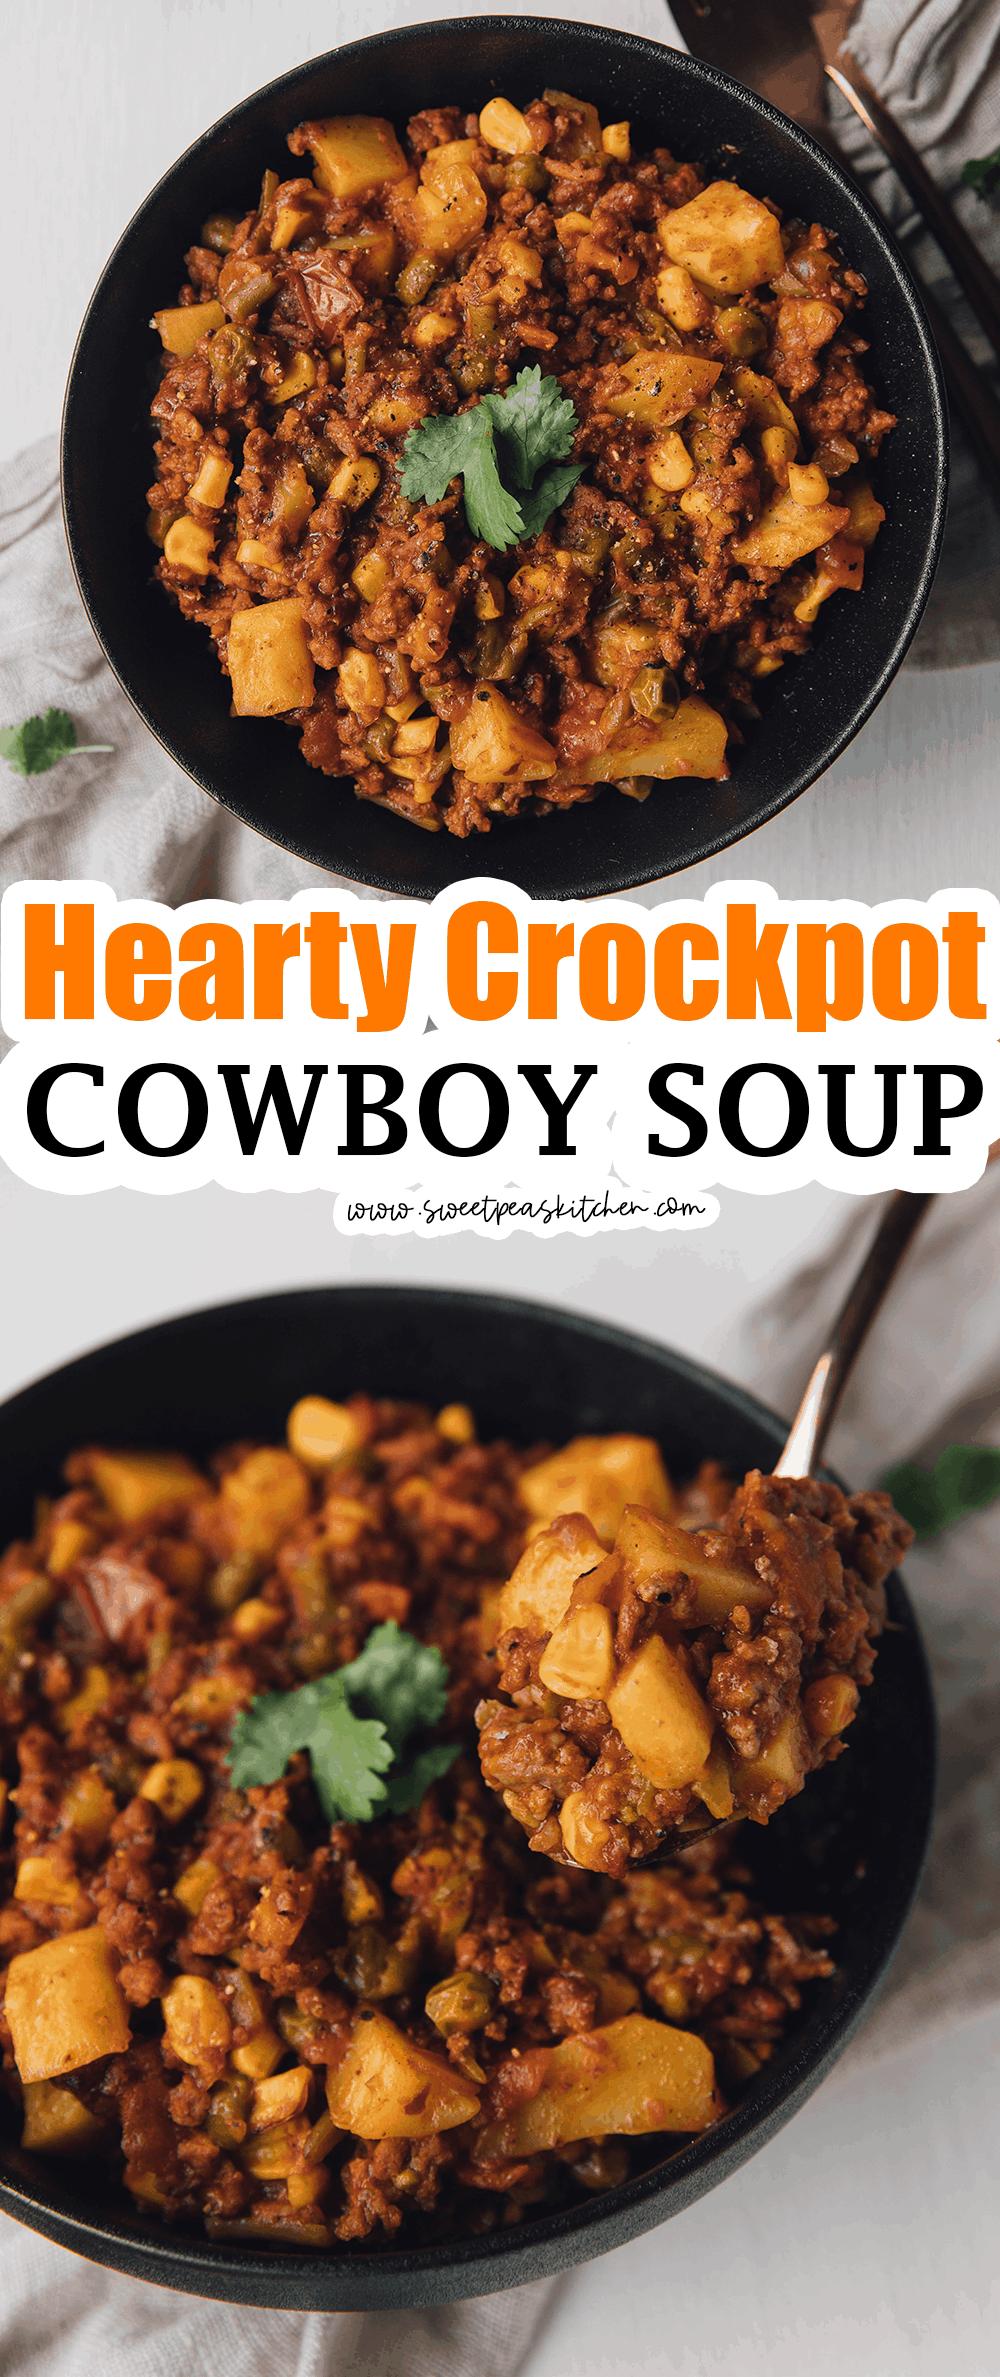 Hearty Crockpot Cowboy Soup